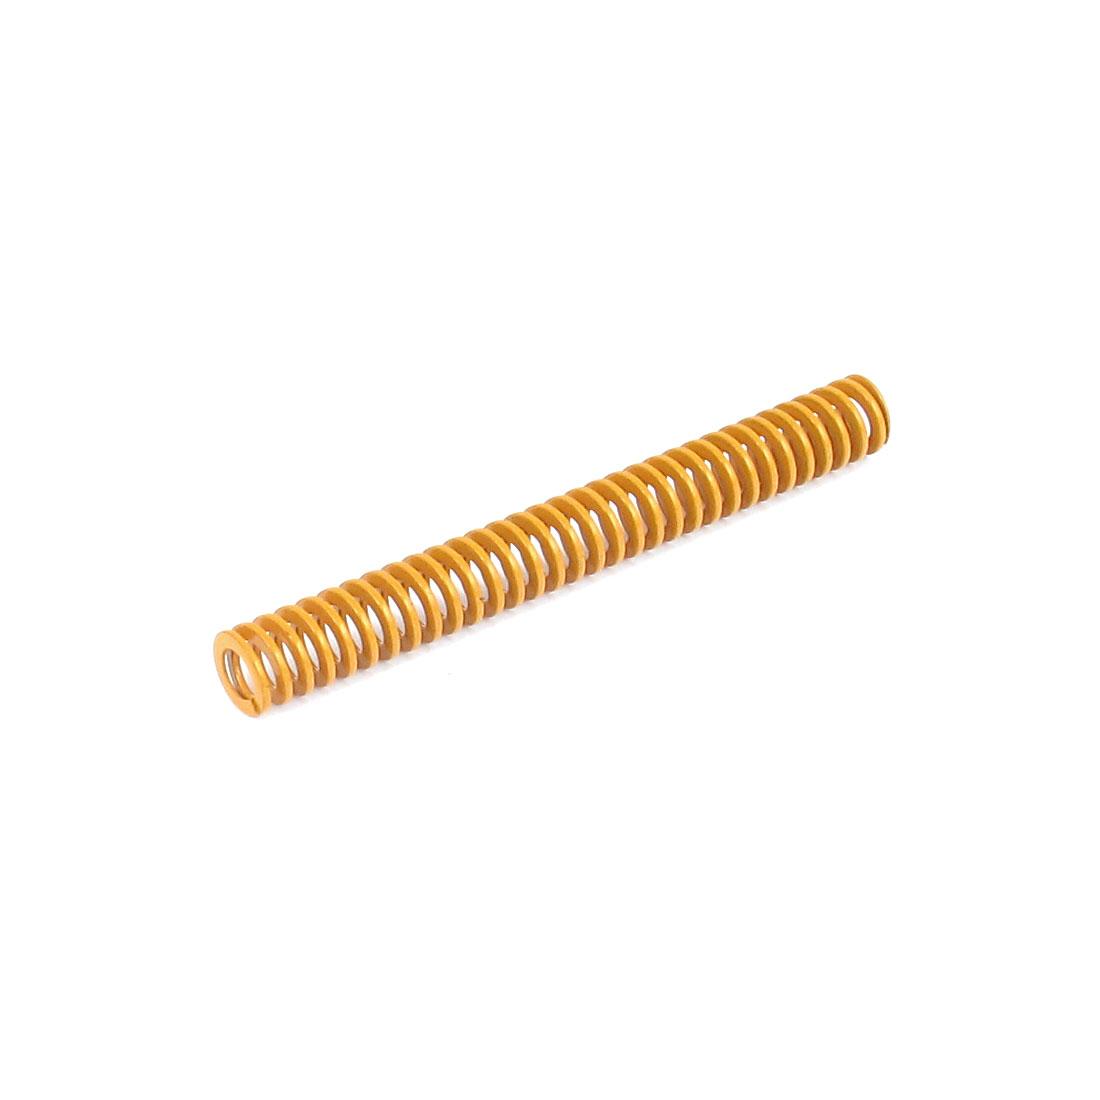 8mmx70mm Chromium Alloy Steel Lightest Load Die Spring Yellow